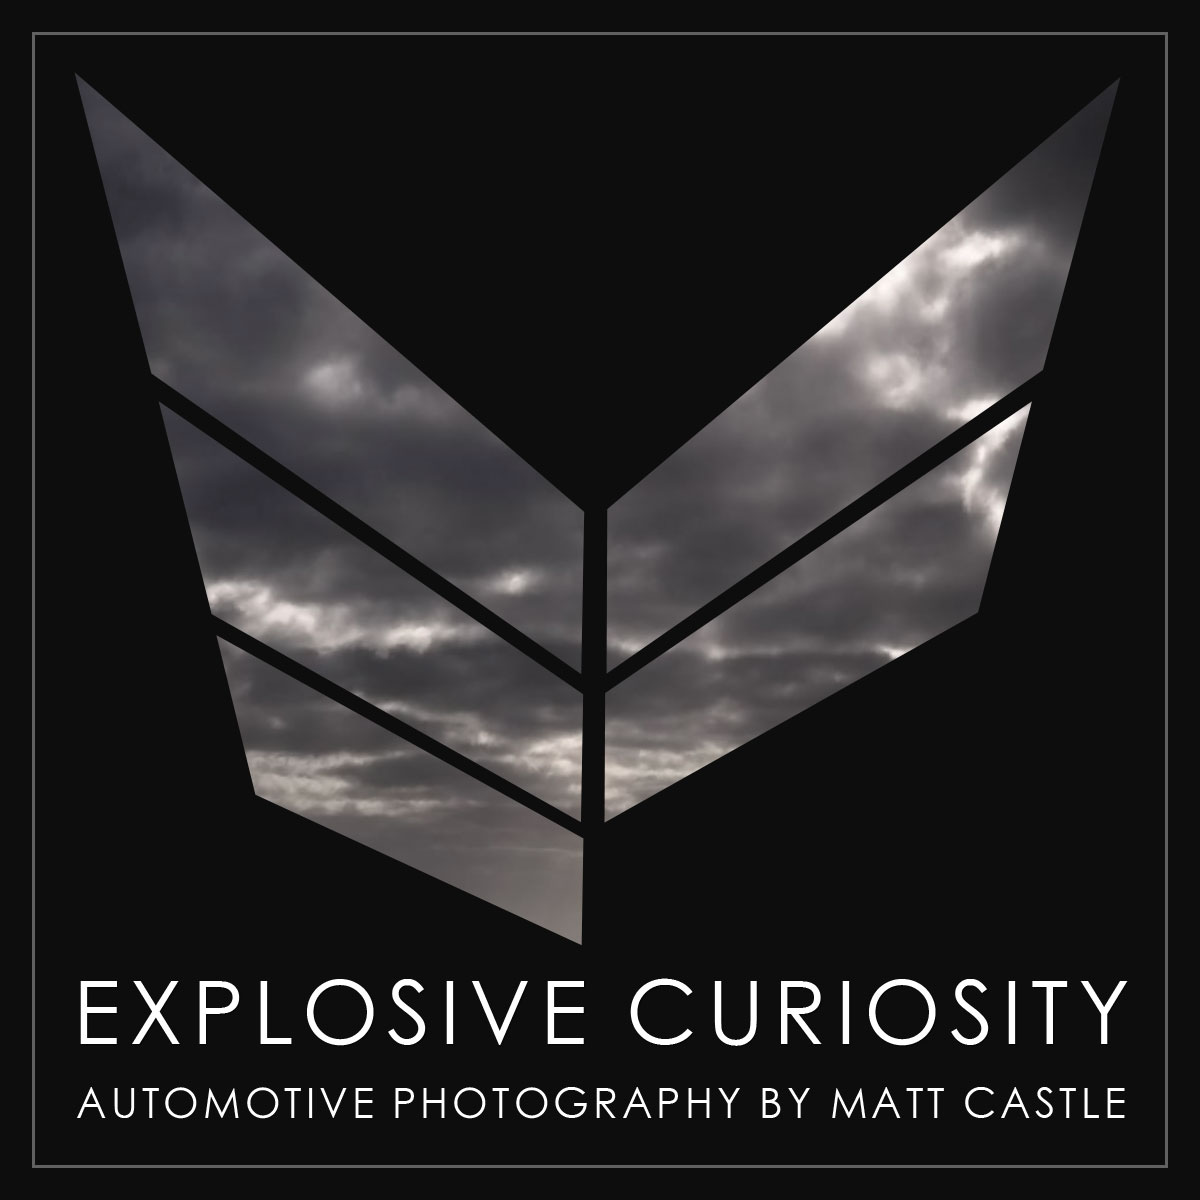 Explosive Curiosity